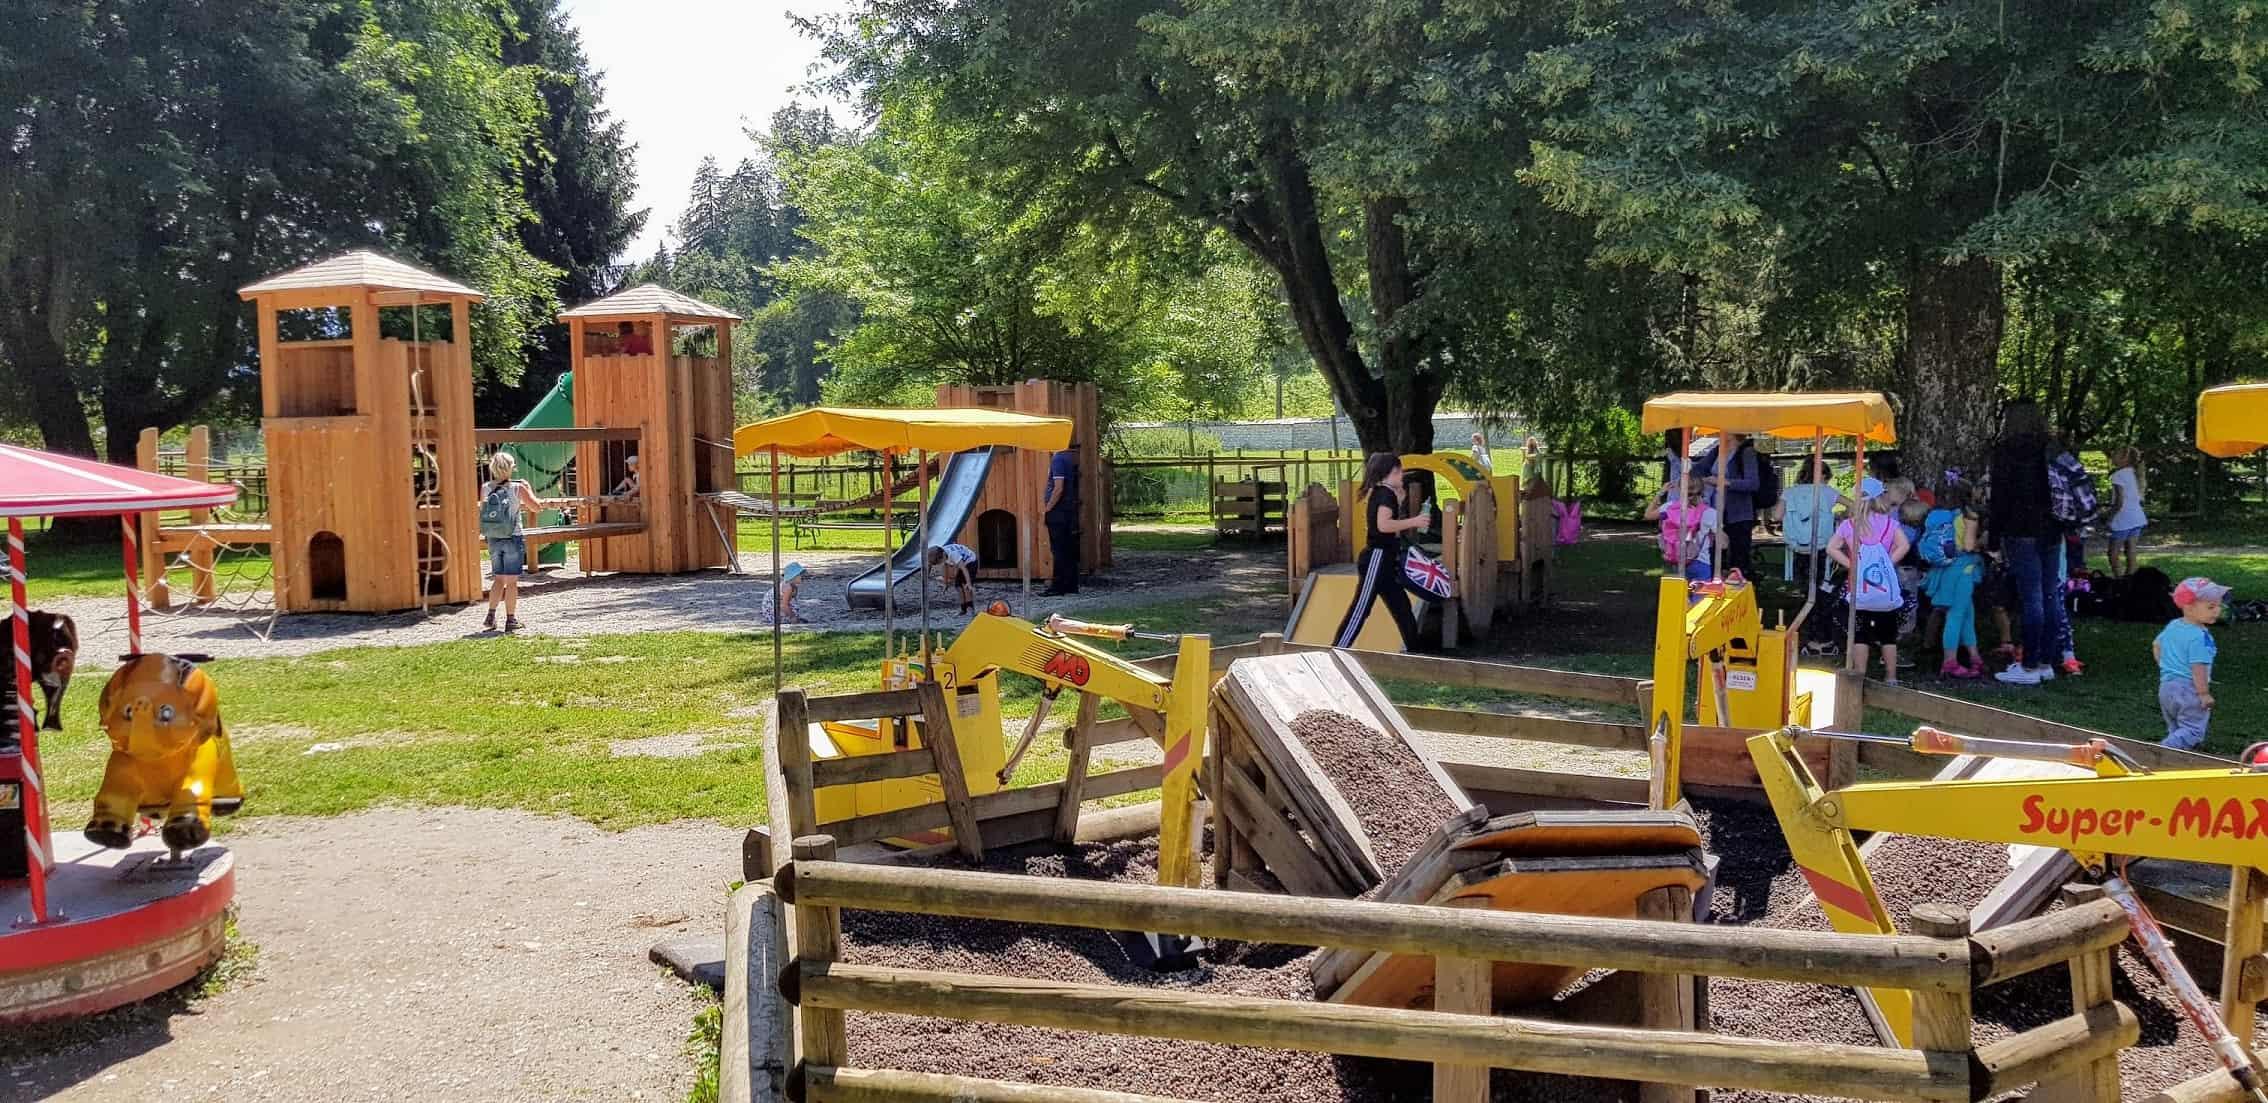 Kinderspielplatz Tierpark Rosegg Aktivitäten Kärnten Wörthersee